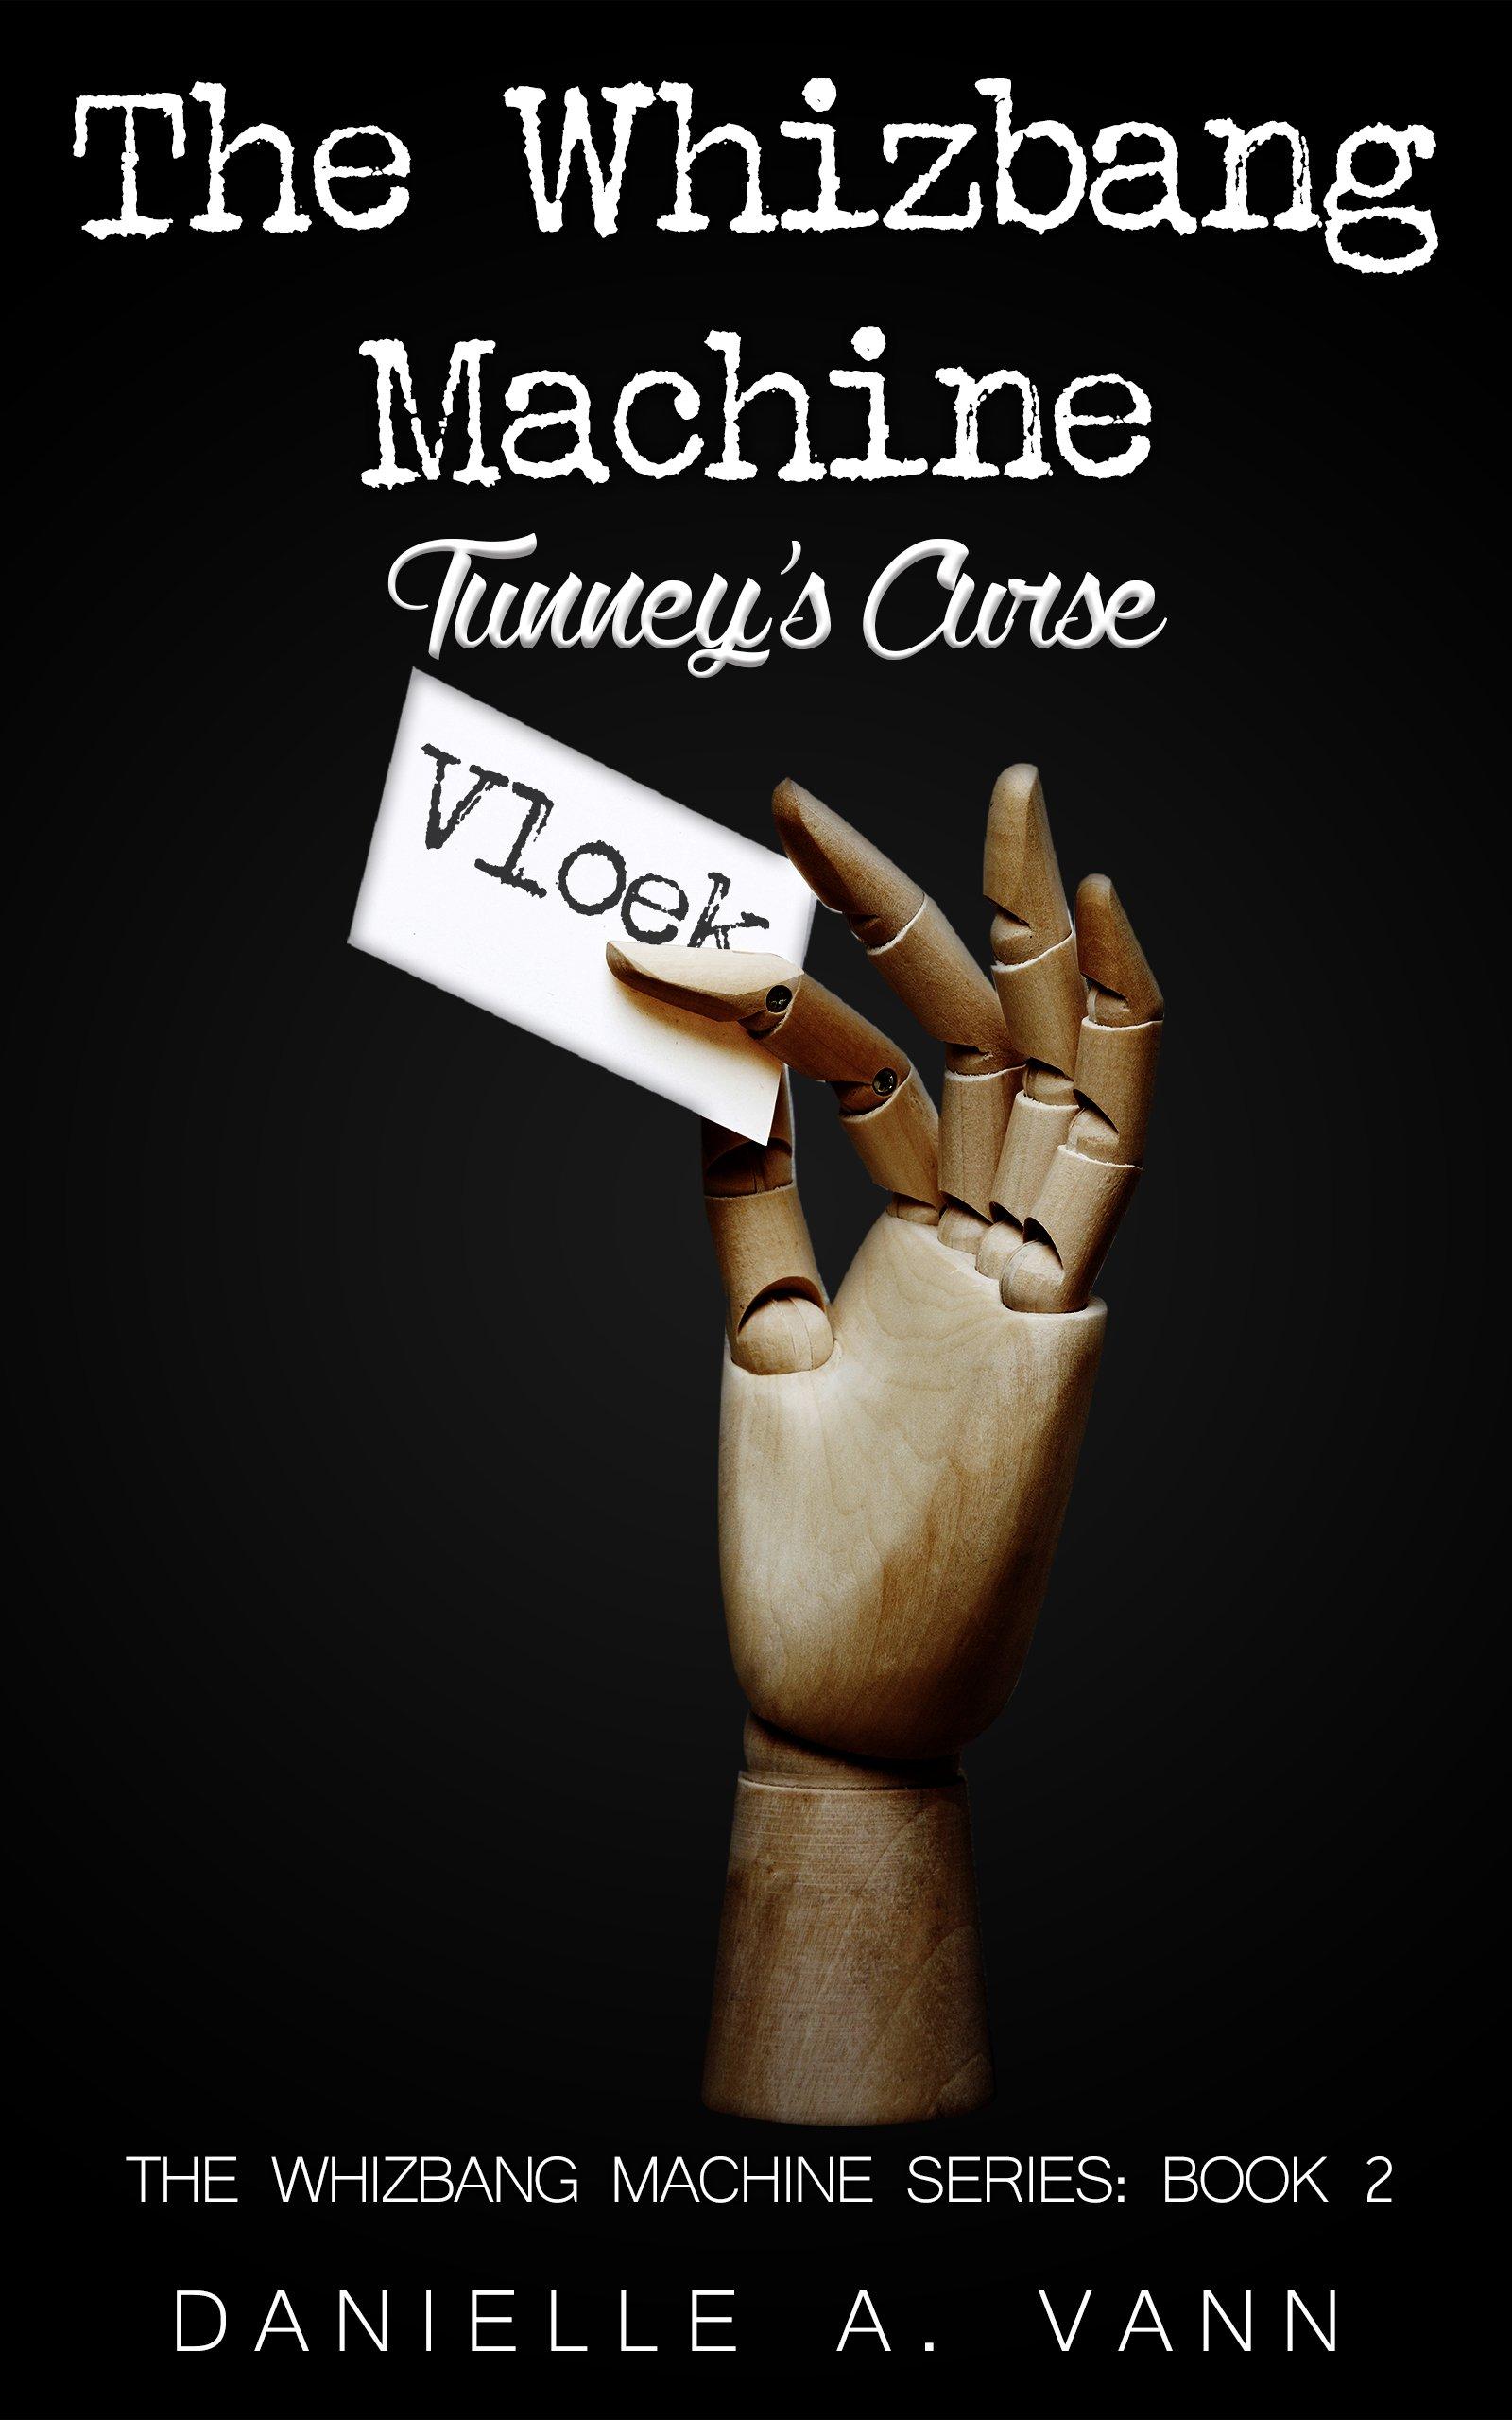 The+Whizbang+Machine+Tunney's+Curse.jpg